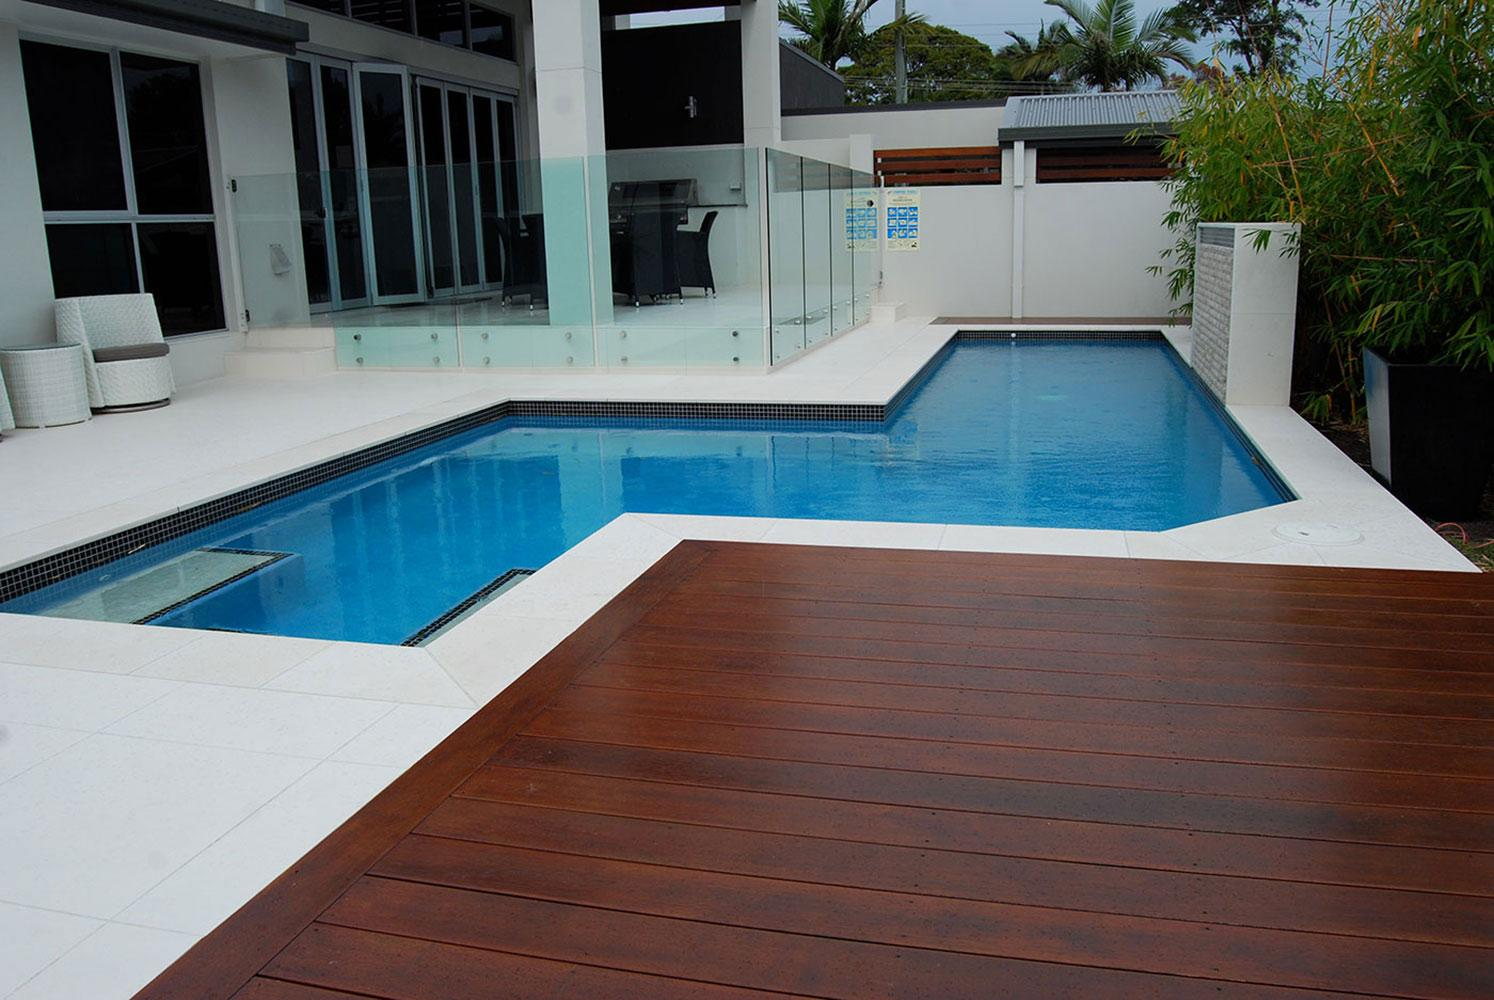 Pool Decking Brisbane Gold Coast Timber Pool Deck Builders